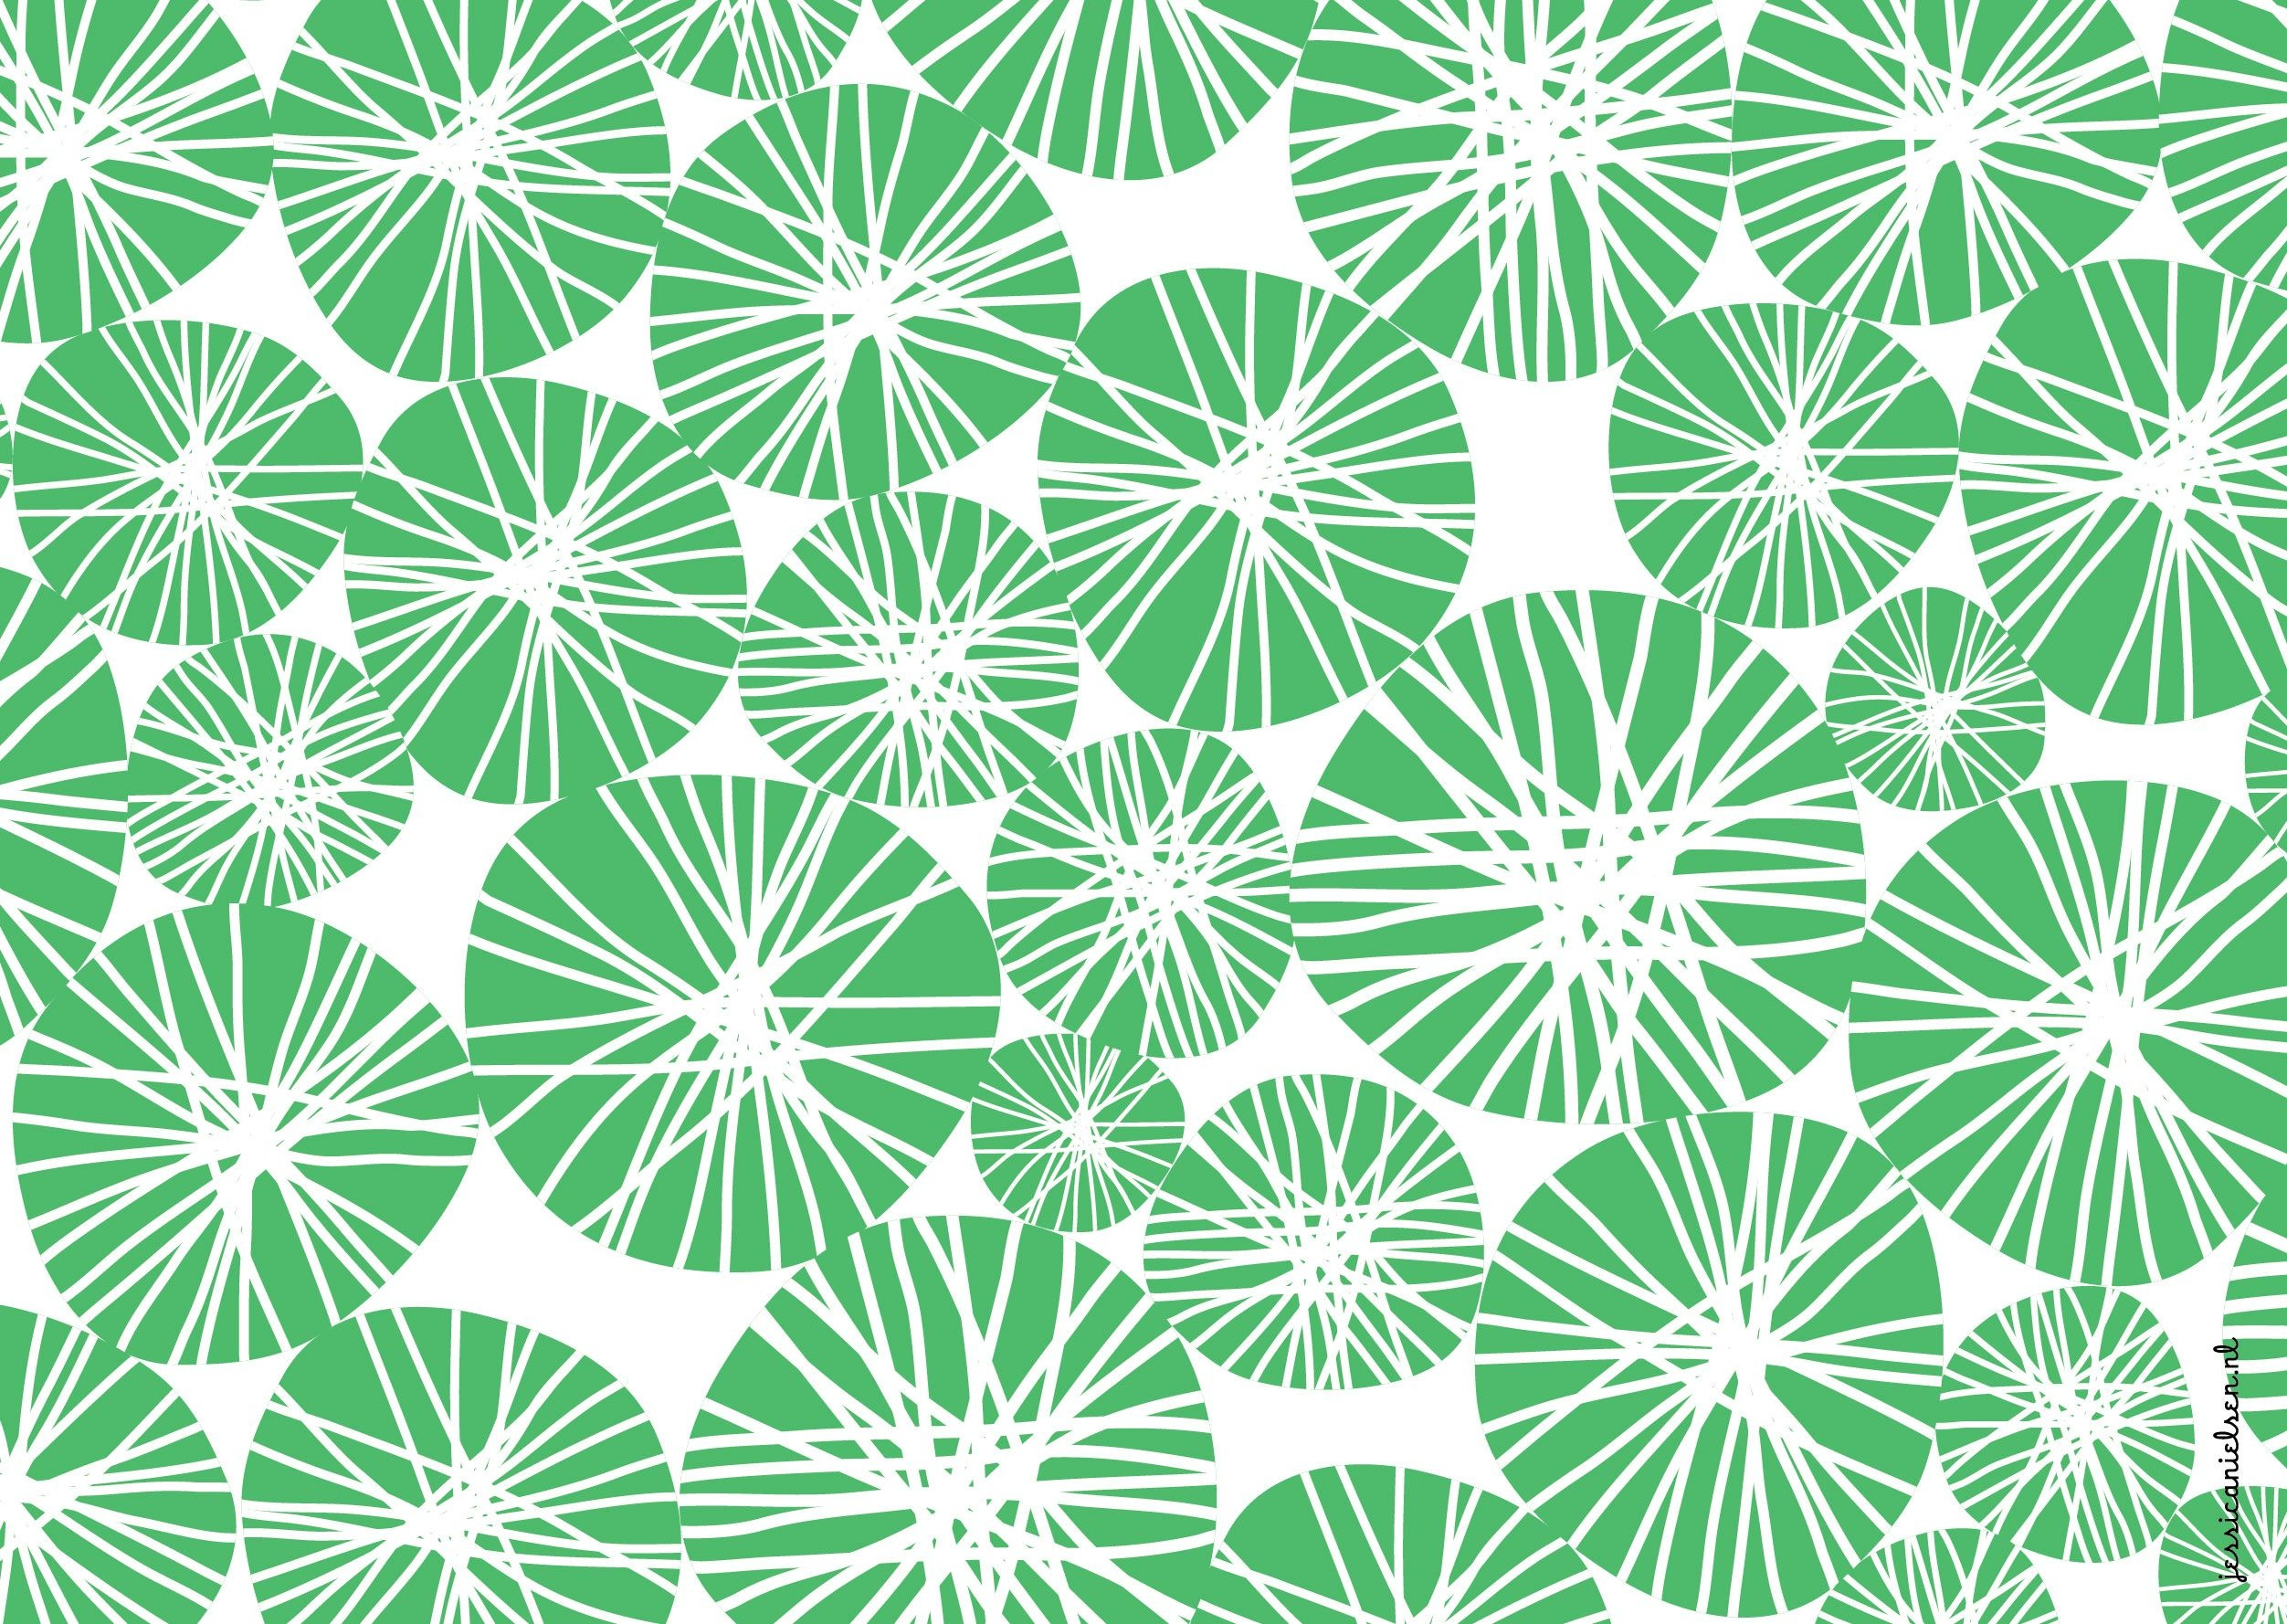 Printable Wrapping Paper La Deuxi Me Collection | Gift Things - Free Printable Wrapping Paper Patterns